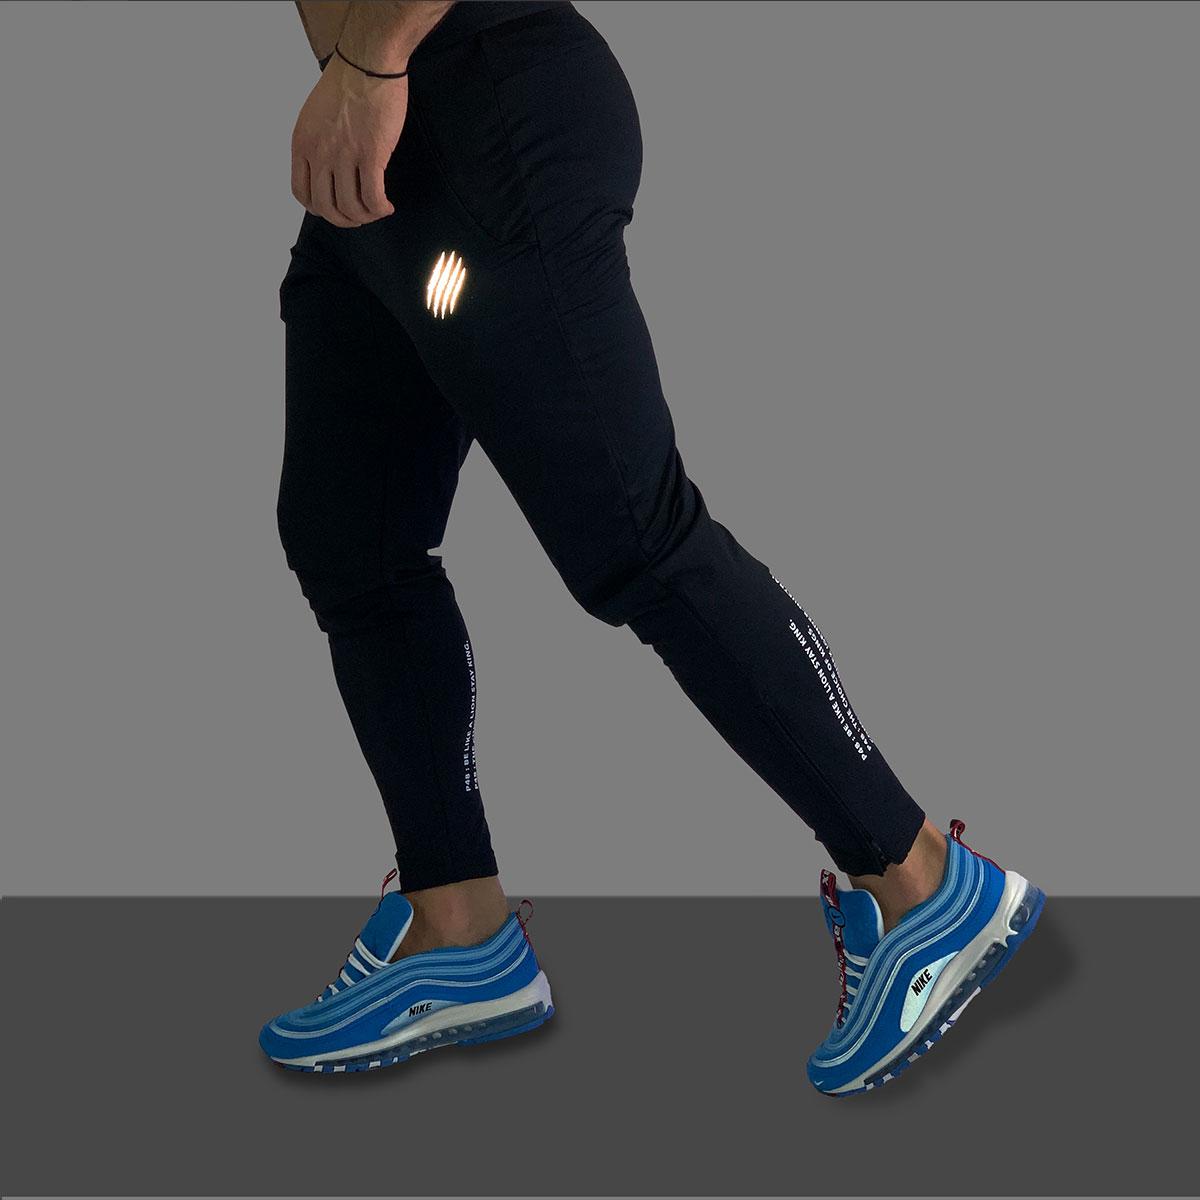 P48 Dri-fit Pants - Black